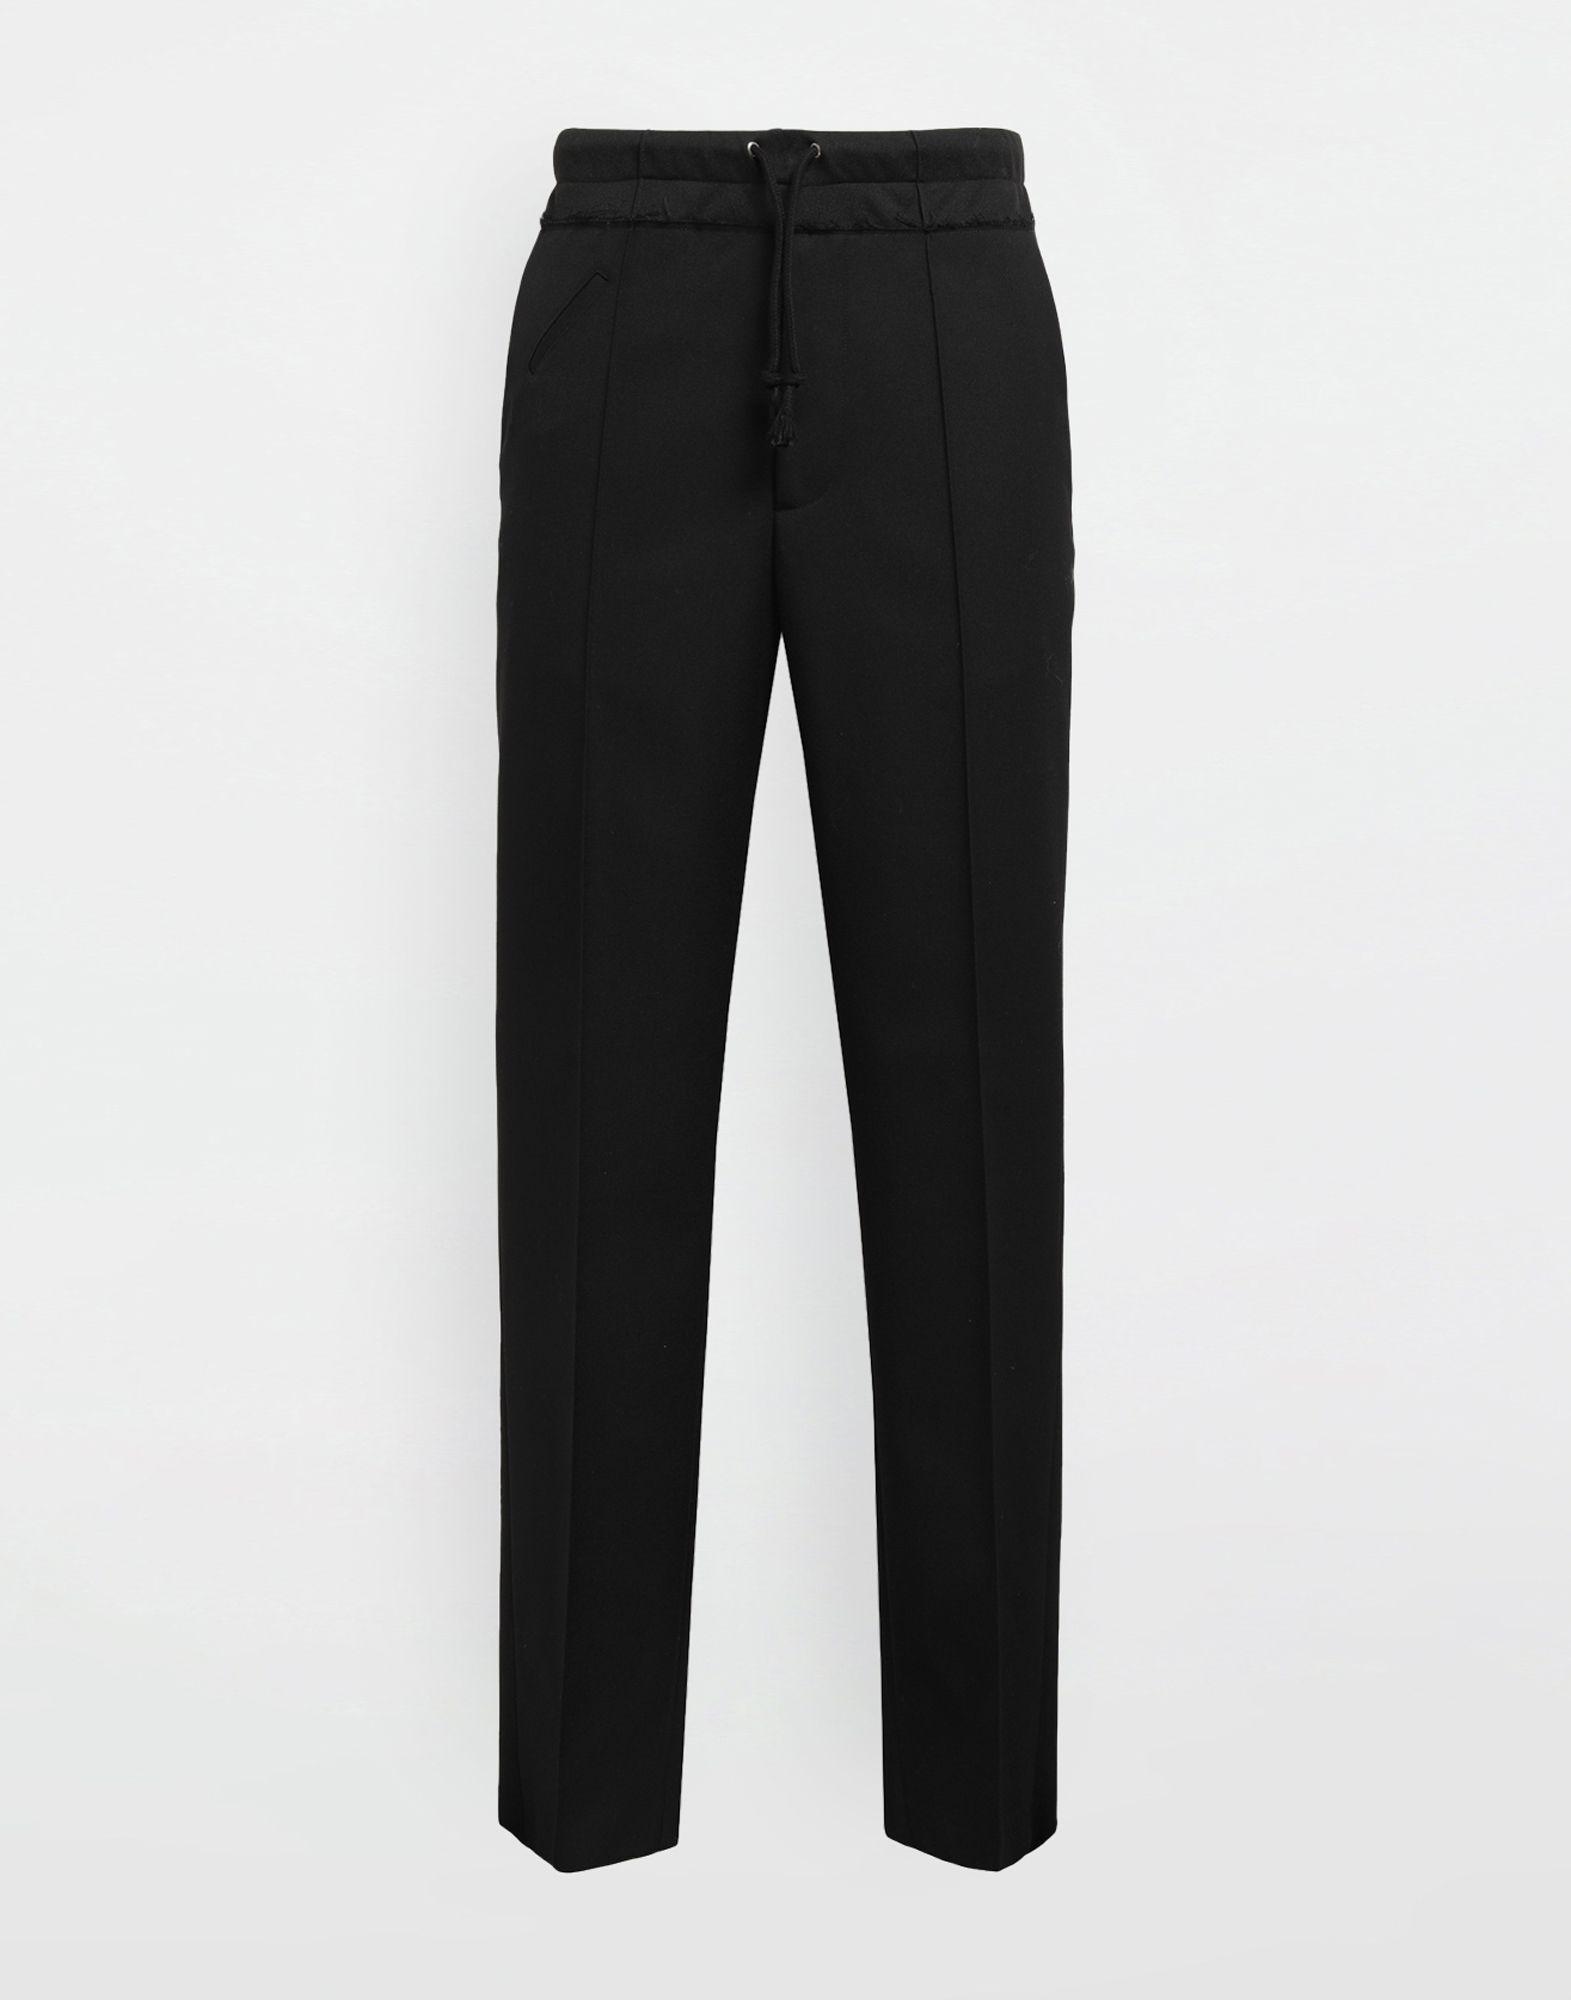 MAISON MARGIELA Spliced waistband pants Casual pants Man f